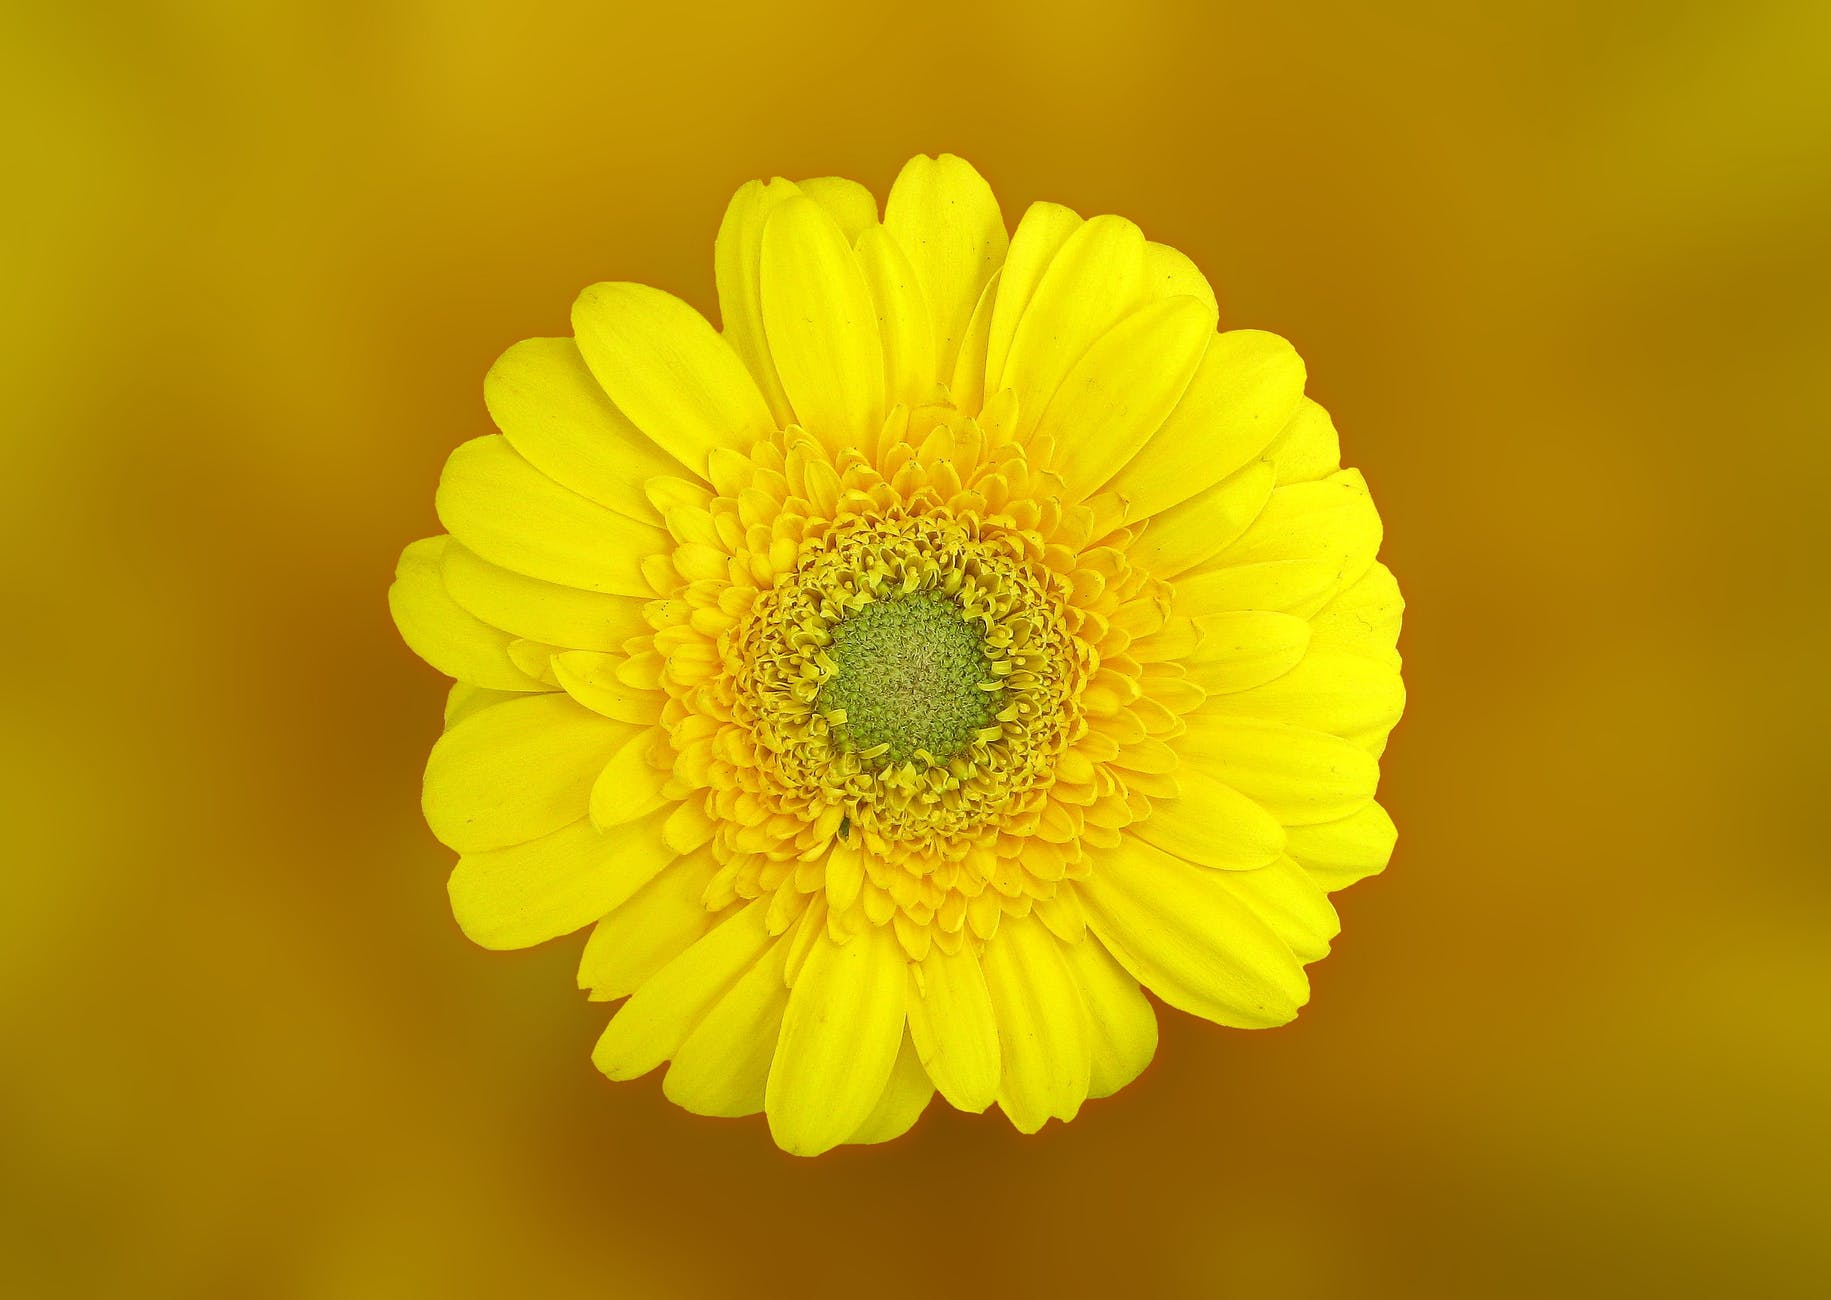 yellow flower bloom blossom